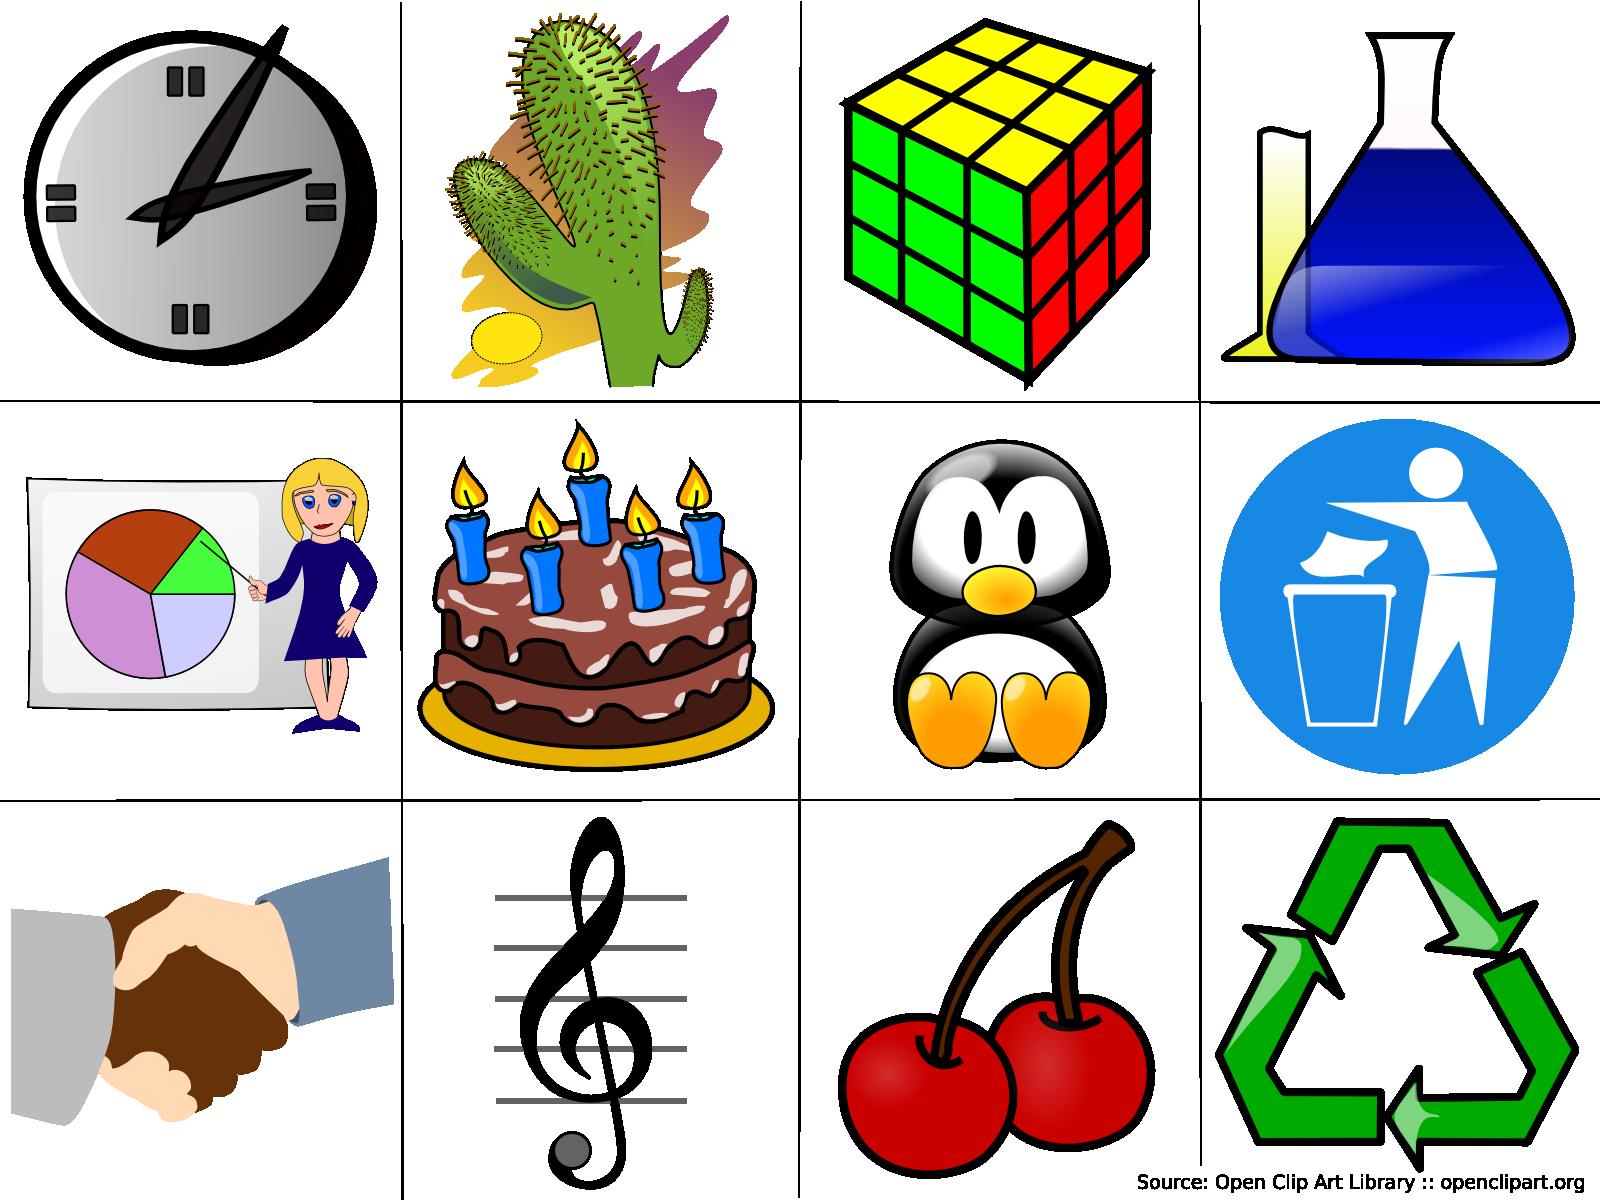 1600x1200 Filecliparts (Examples).png